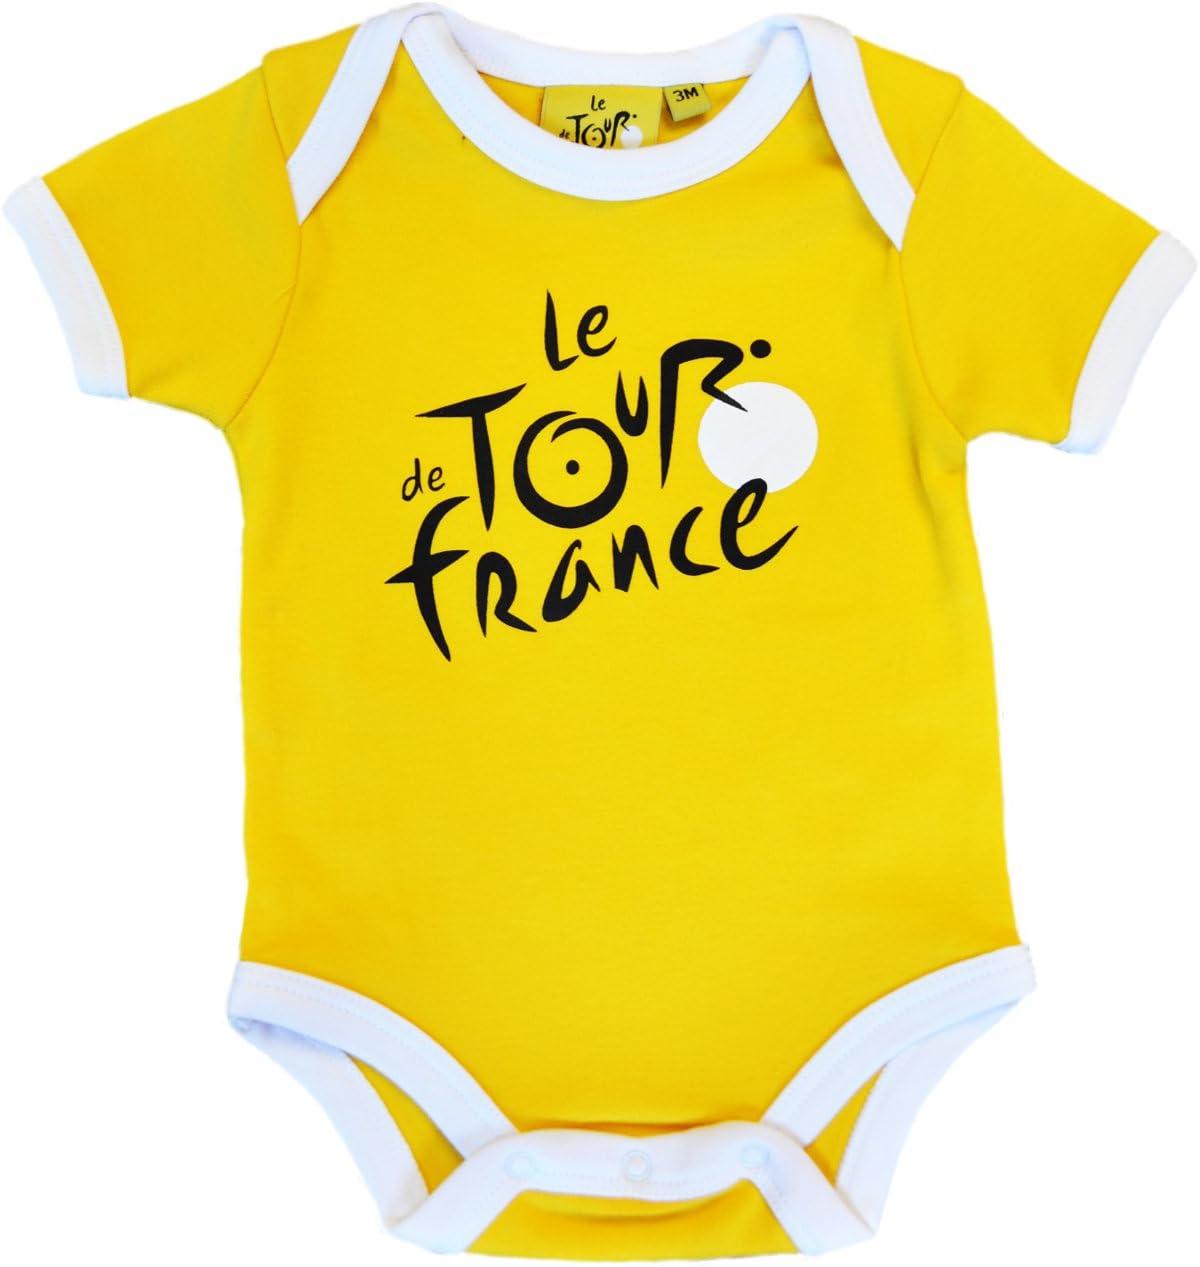 Body bebé Le Tour de France de ciclismo – Collection officielle – Talla bebé niño, color amarillo, tamaño 3 meses: Amazon.es: Deportes y aire libre